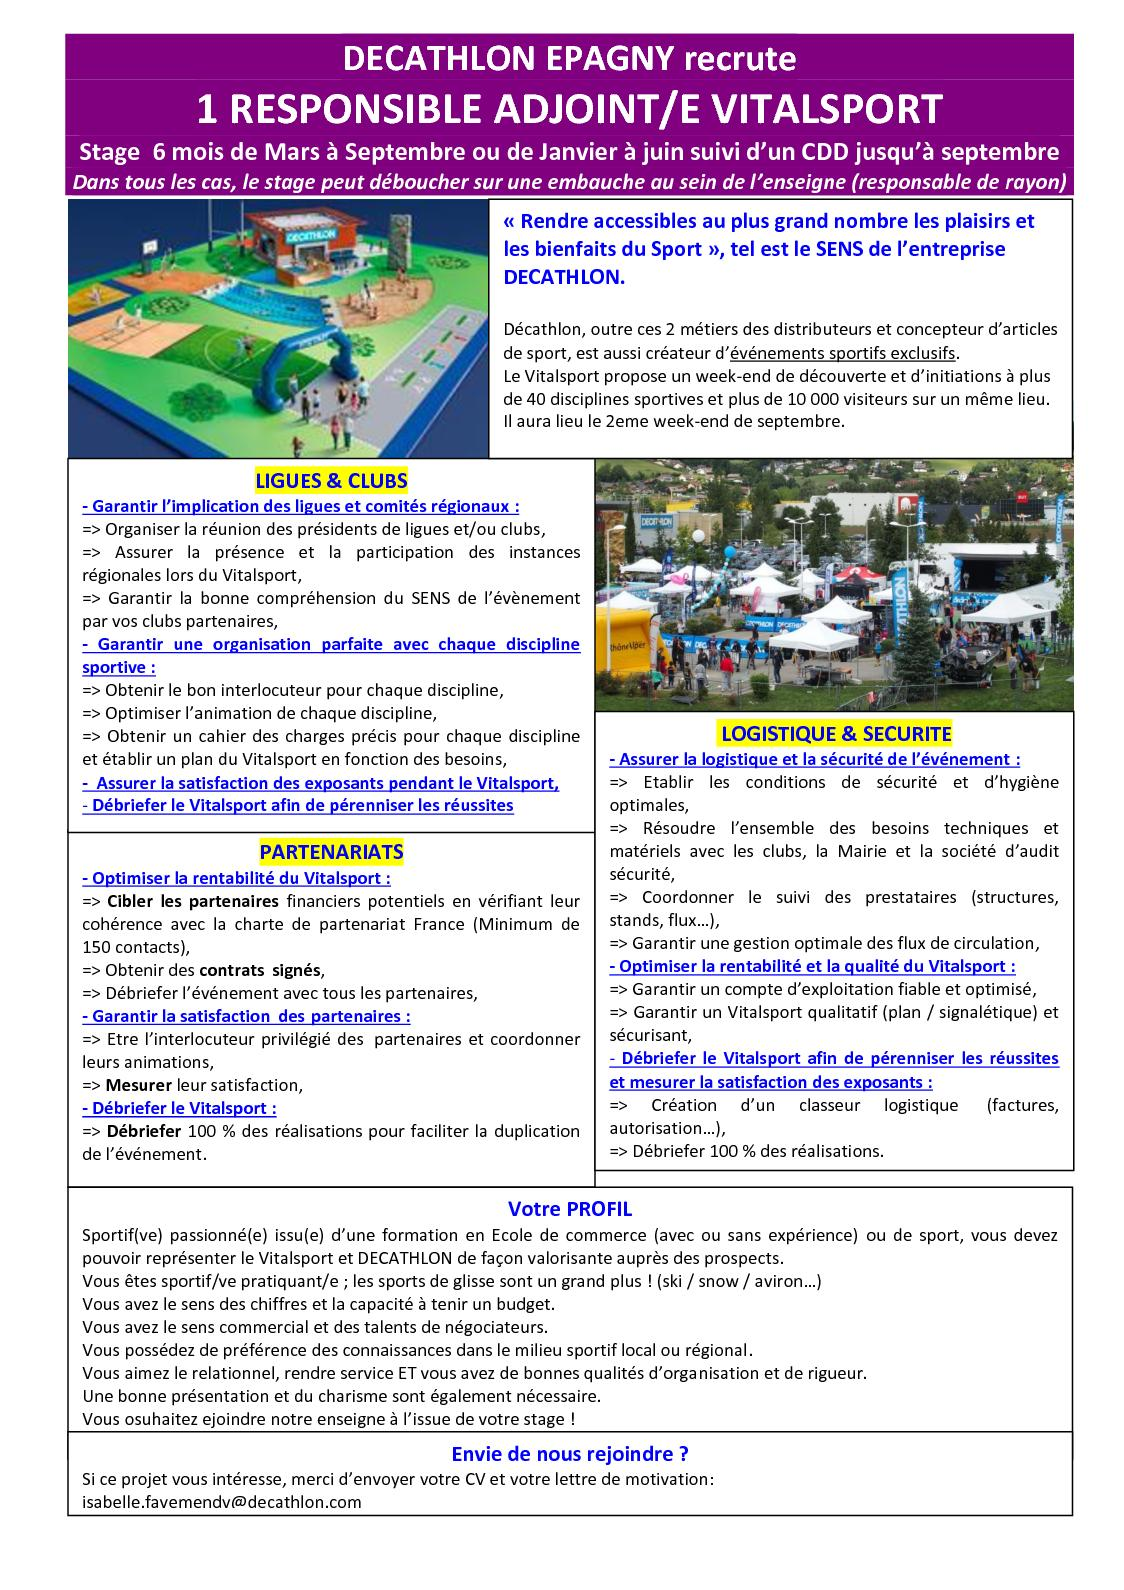 Calaméo 07 02 18 Stage Cdd Vitalsport Decathlon Epagny